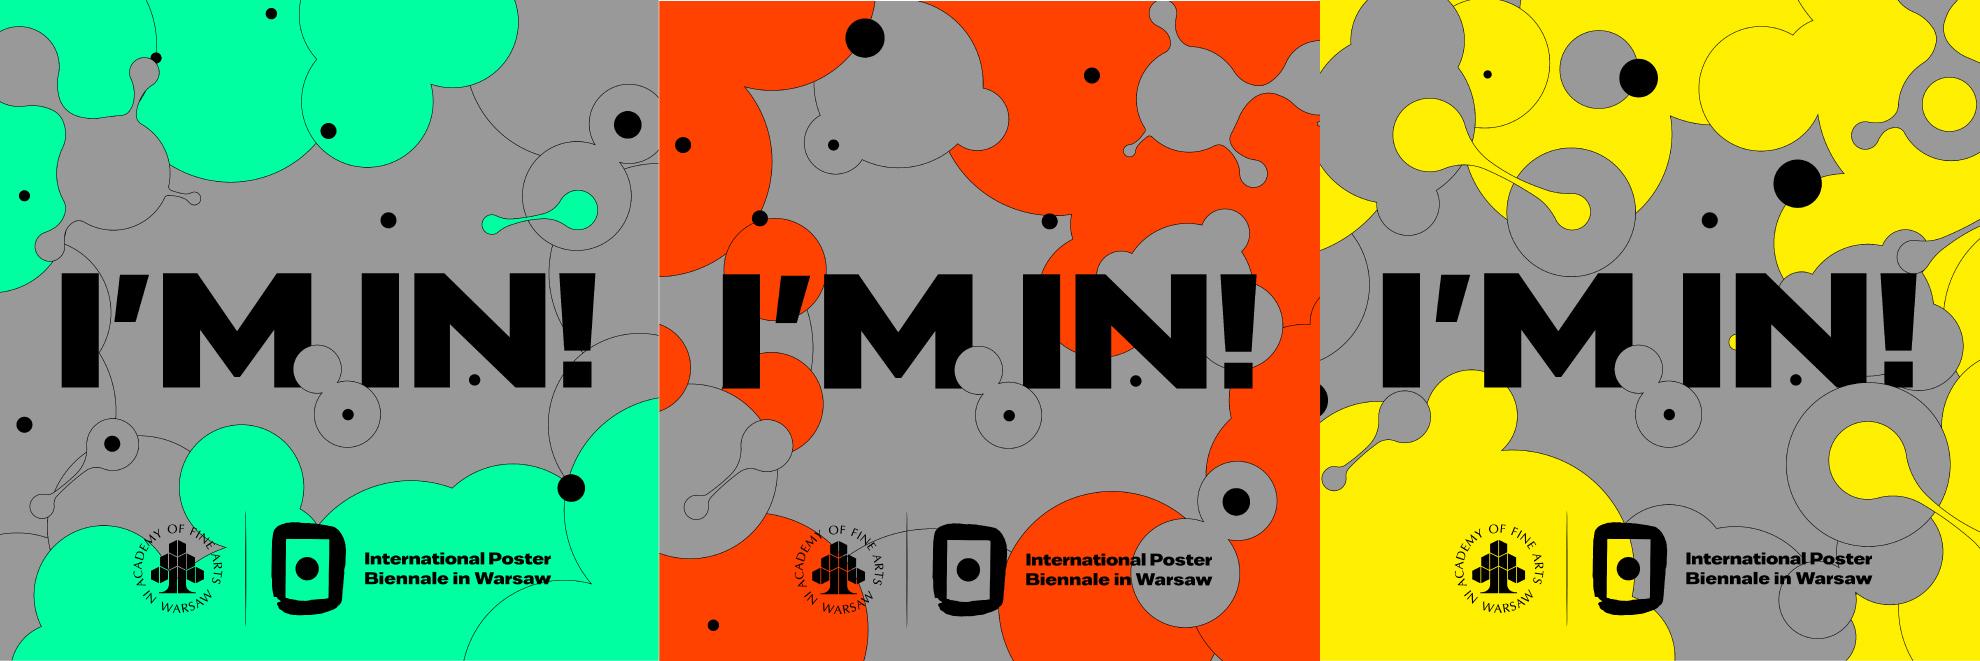 27th International Poster Biennale in Warsaw